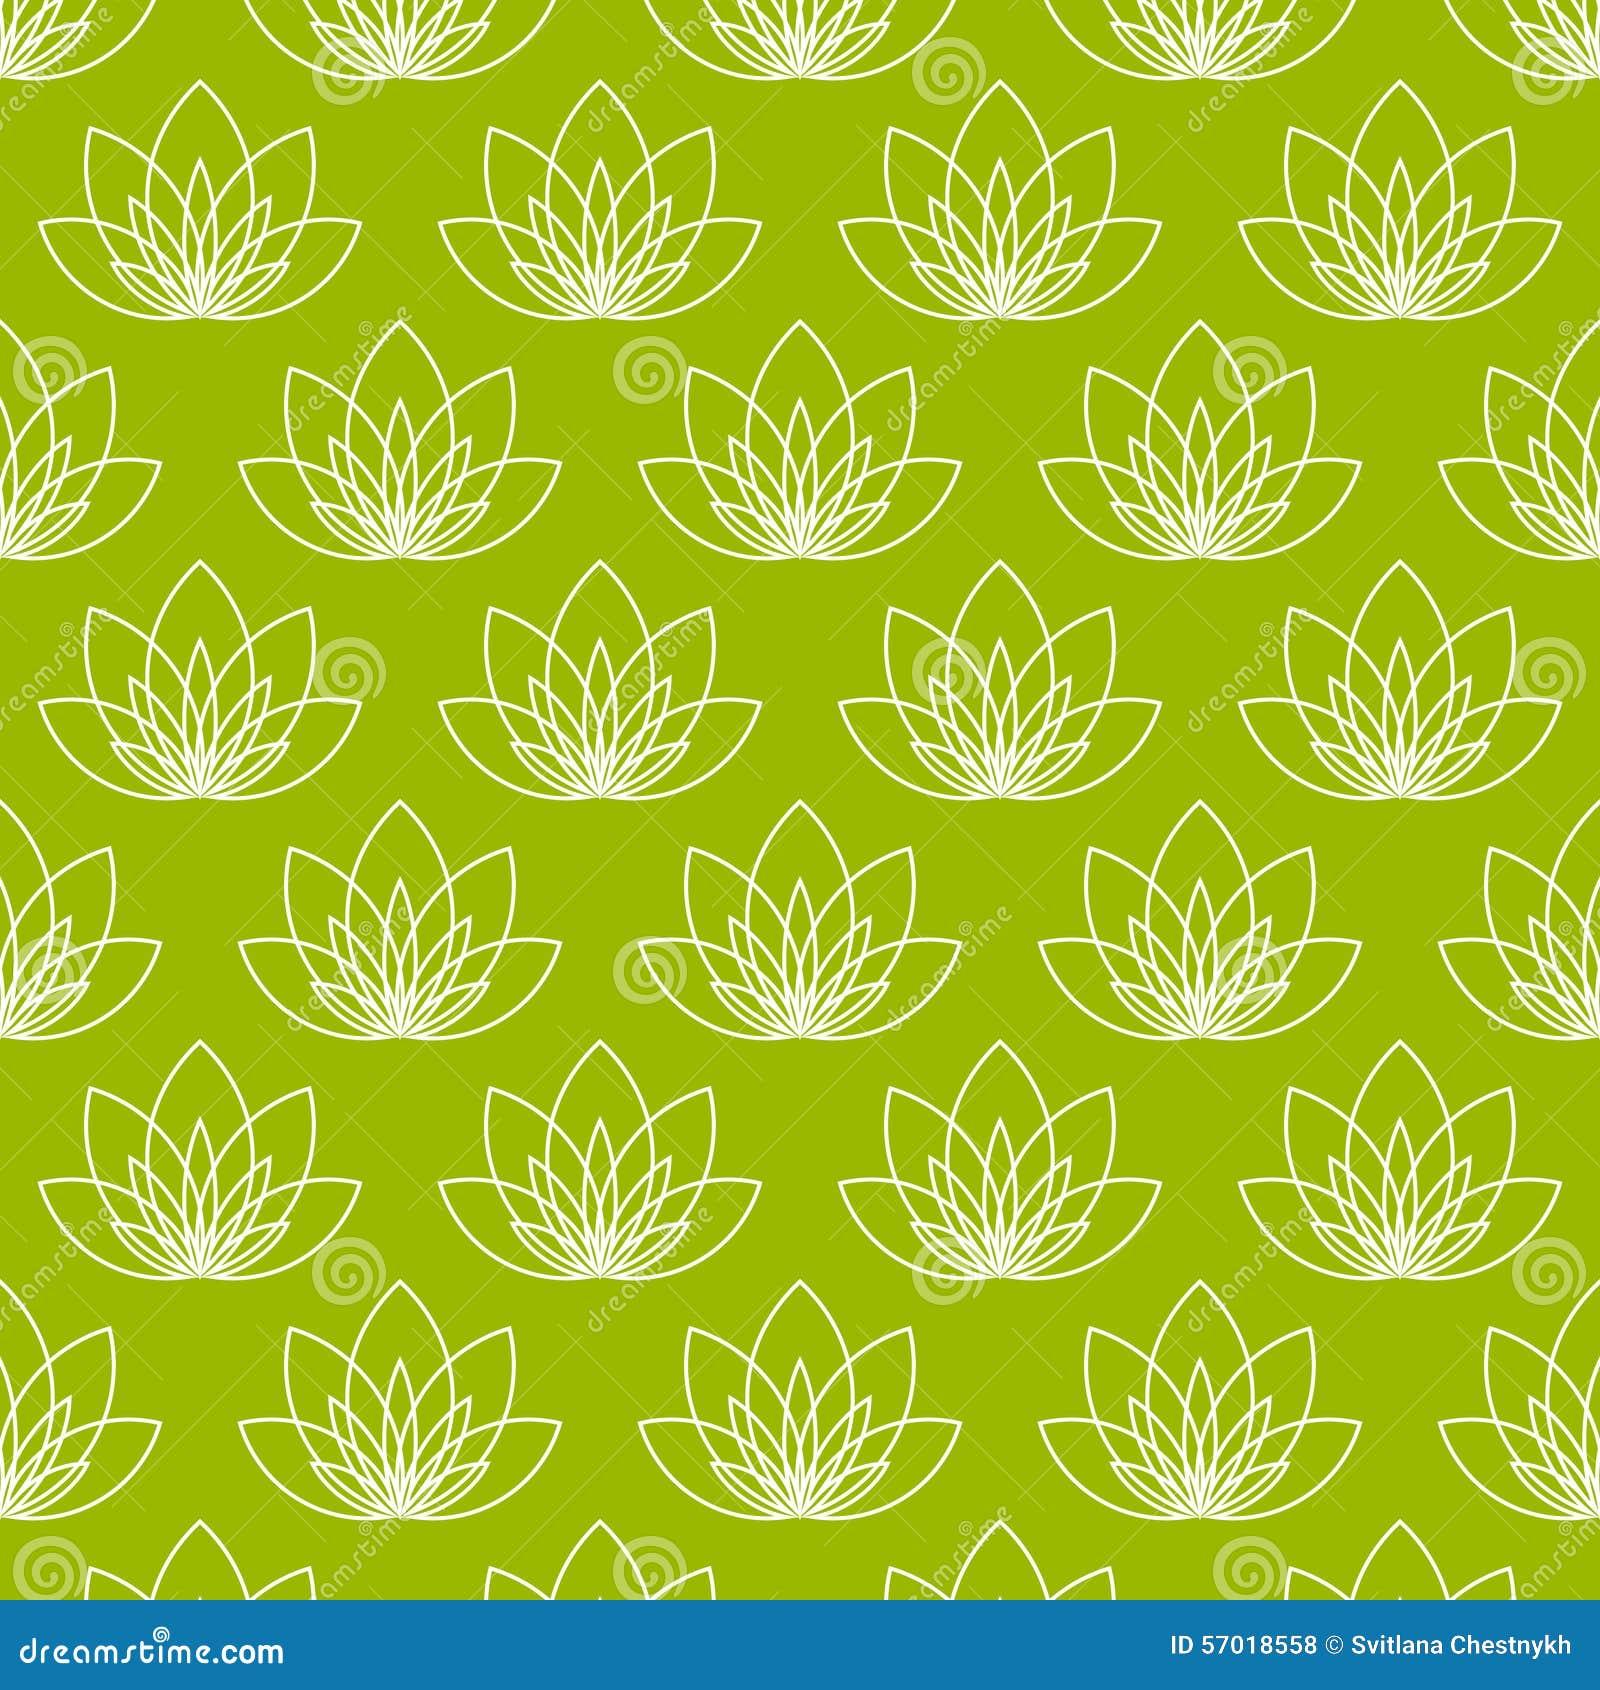 Lotus Flower As Symbol Of Yoga Stock Vector Illustration Of Green